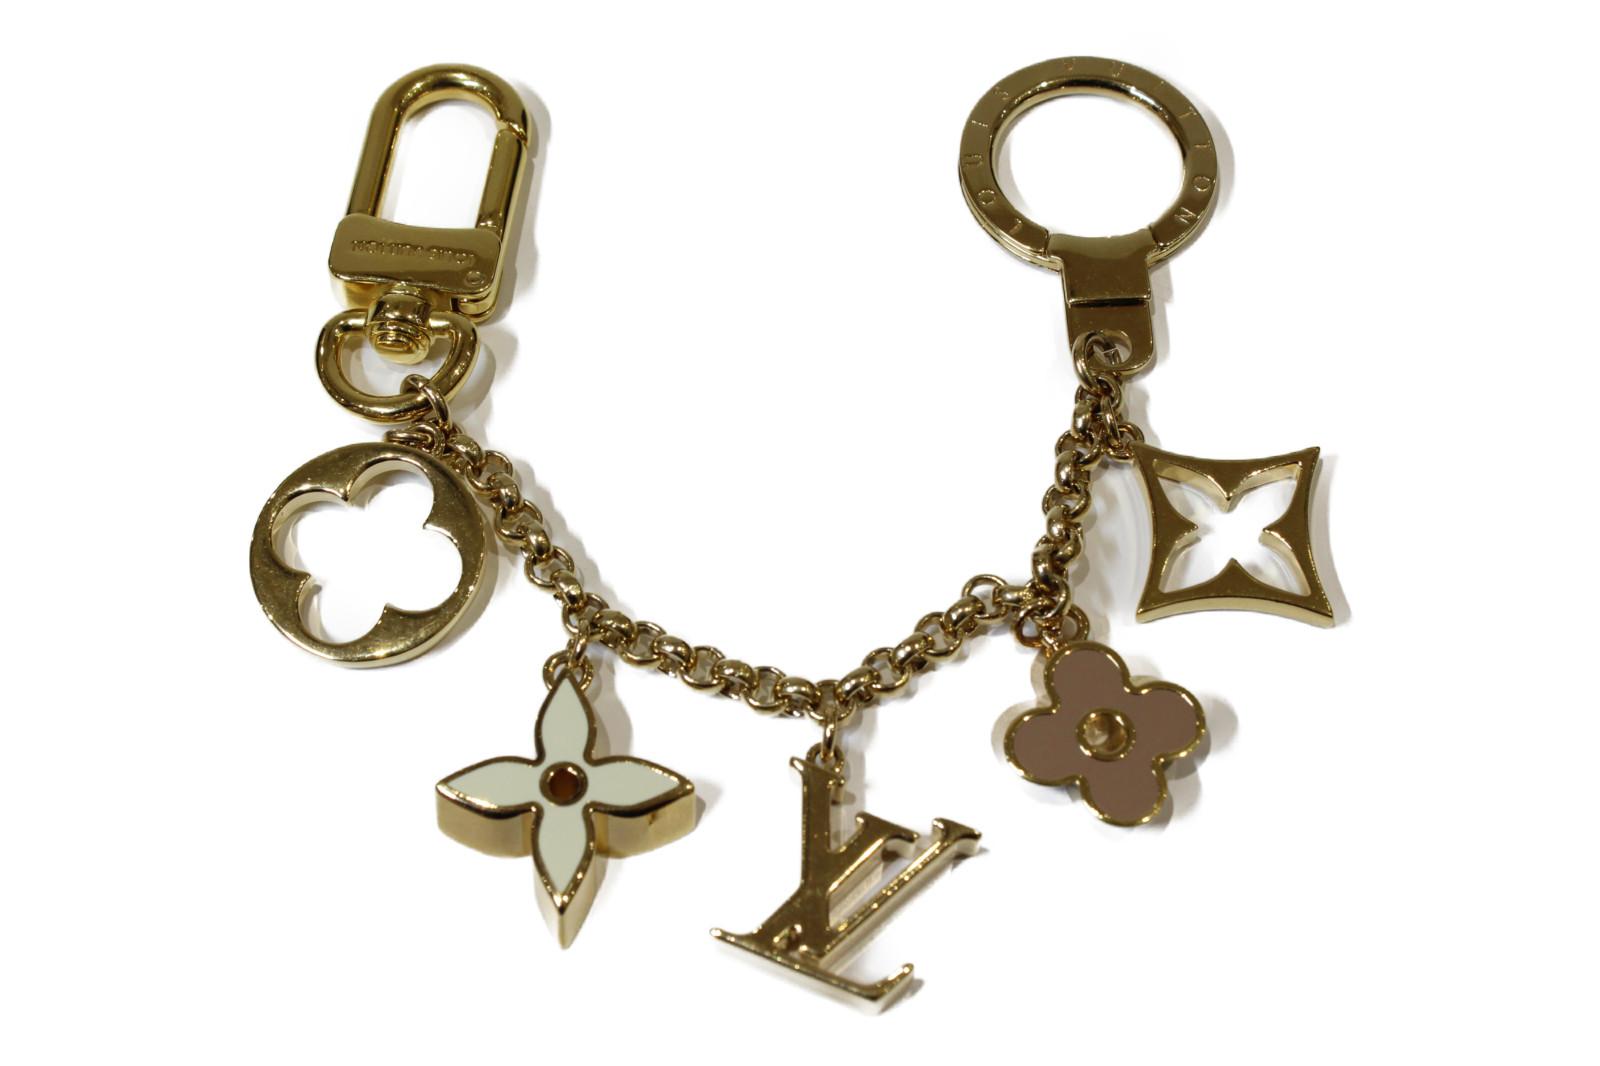 LOUIS VUITTON ルイヴィトンバッグチャーム・チェーンフルールドゥ M65111チャーム 花 キーホルダープレゼント包装可 【中古】